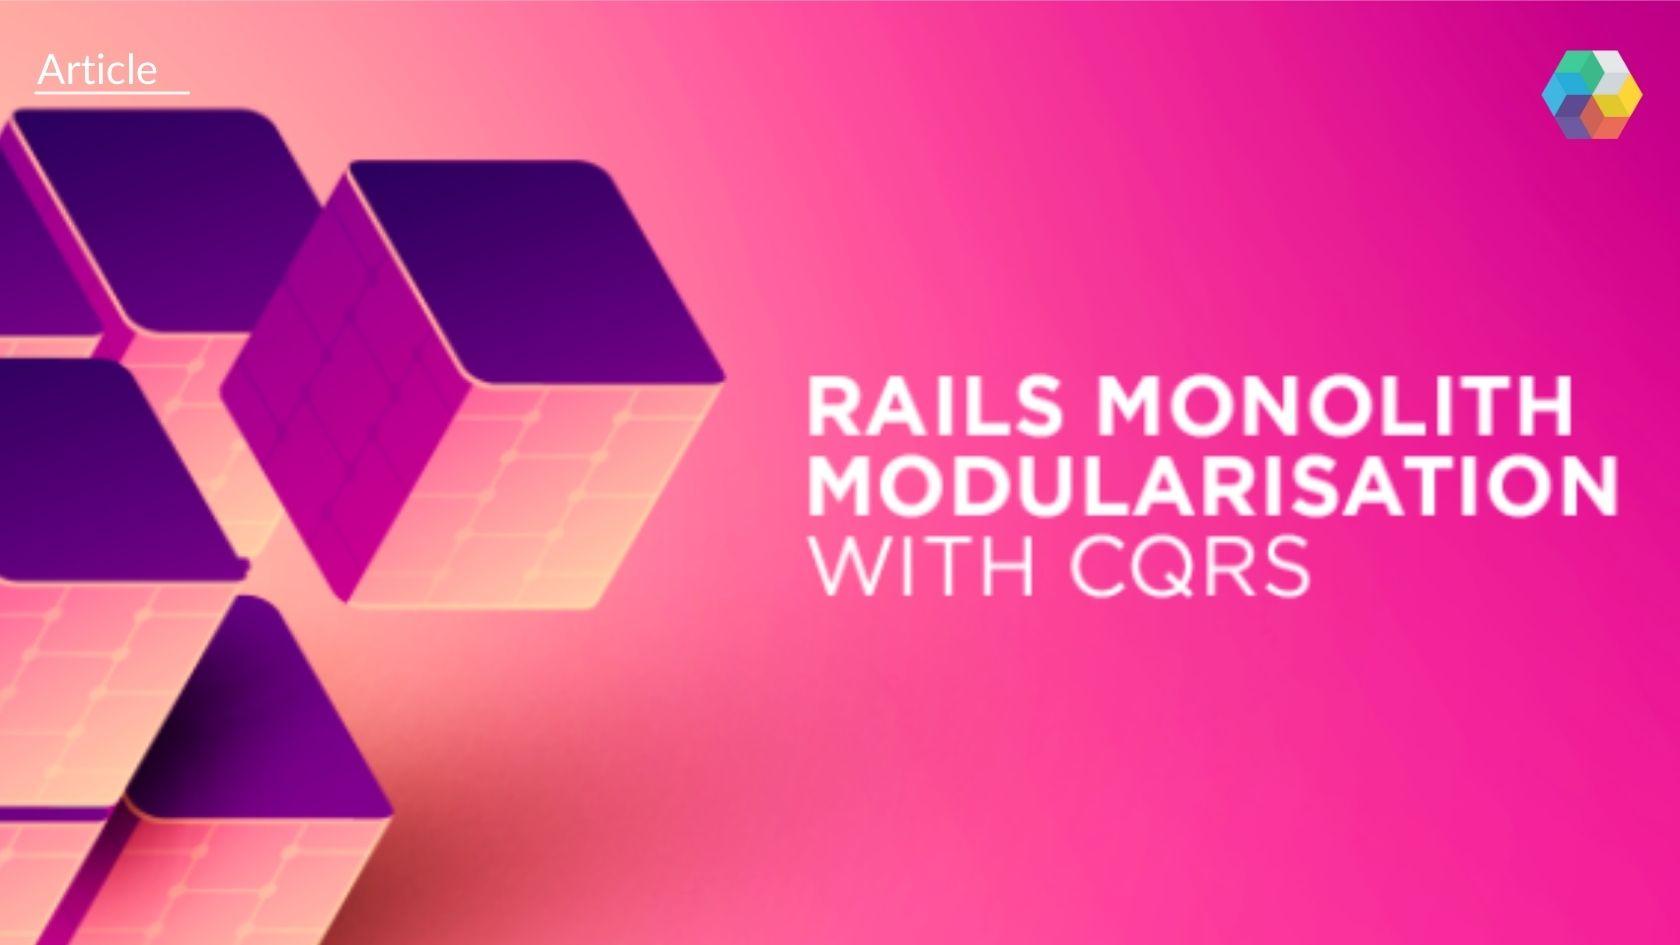 Rails Monolith Modularisation with CQRS